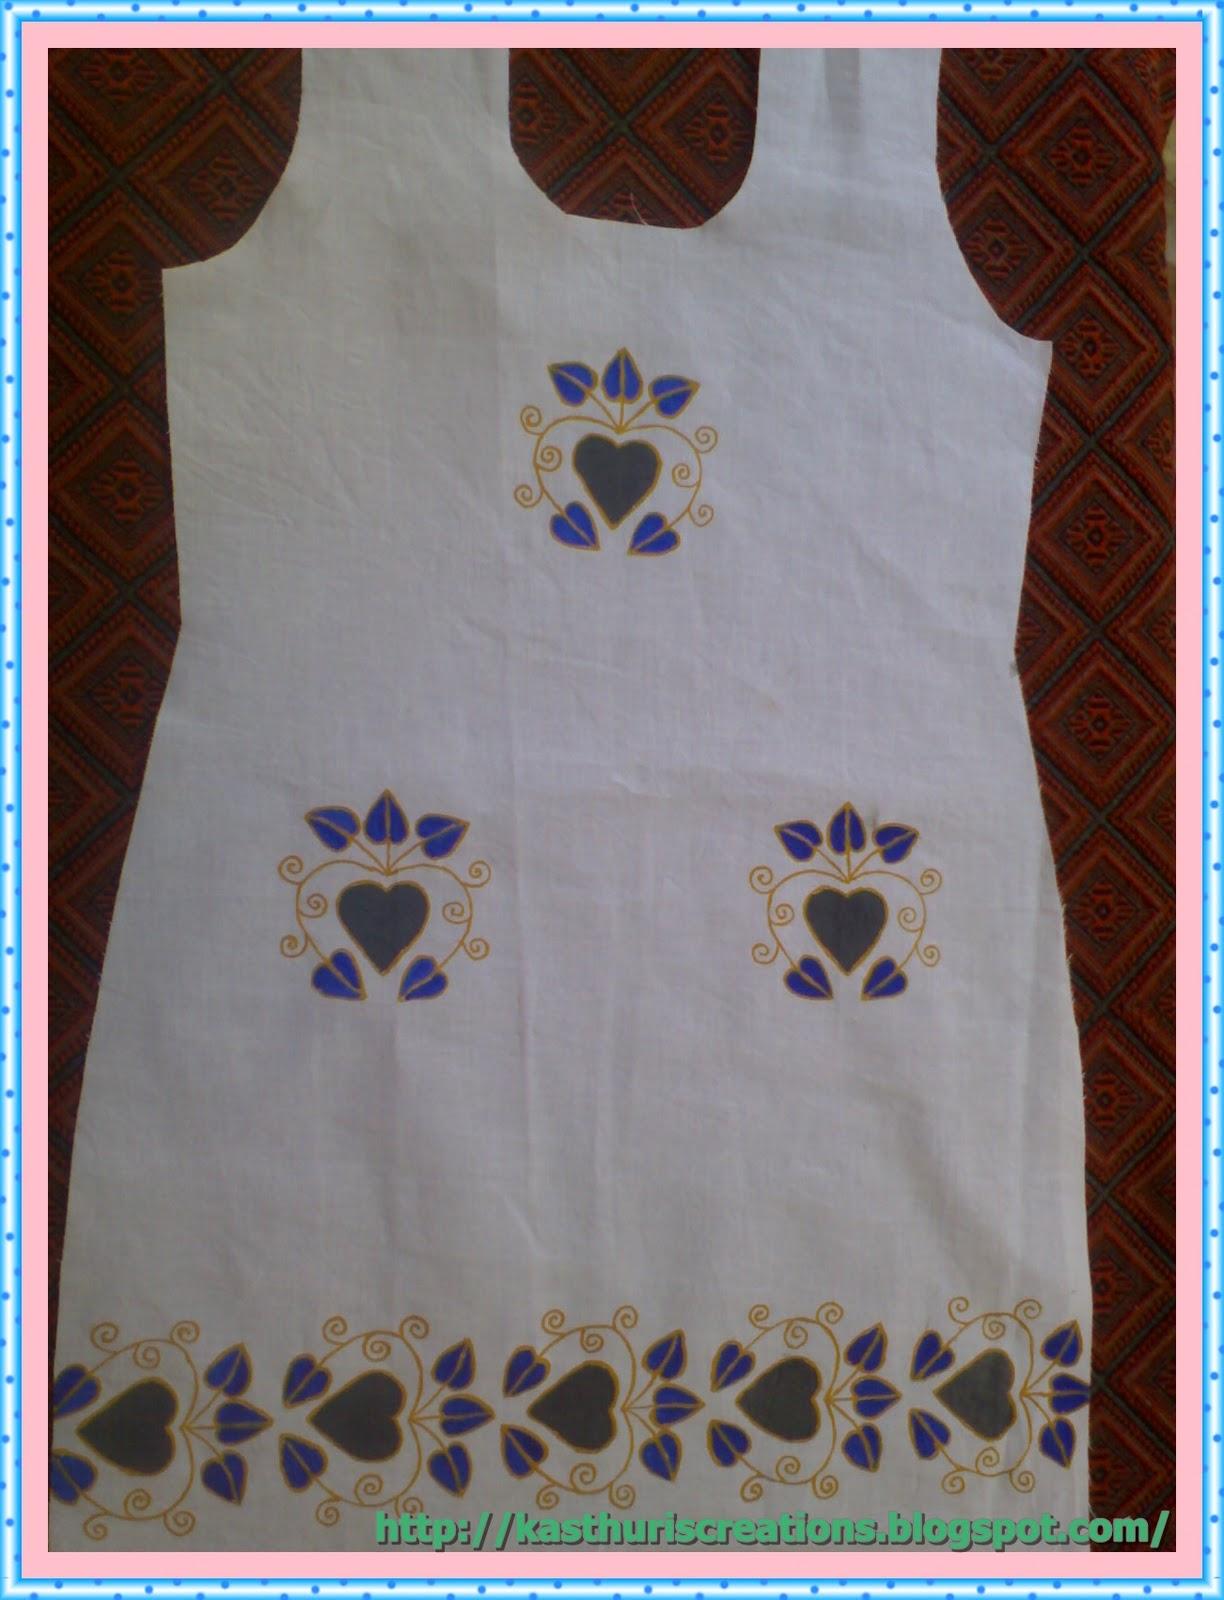 MaNiKa: Fabric painting in Kurti,Frock for fabric painting designs on white kurtis  103wja